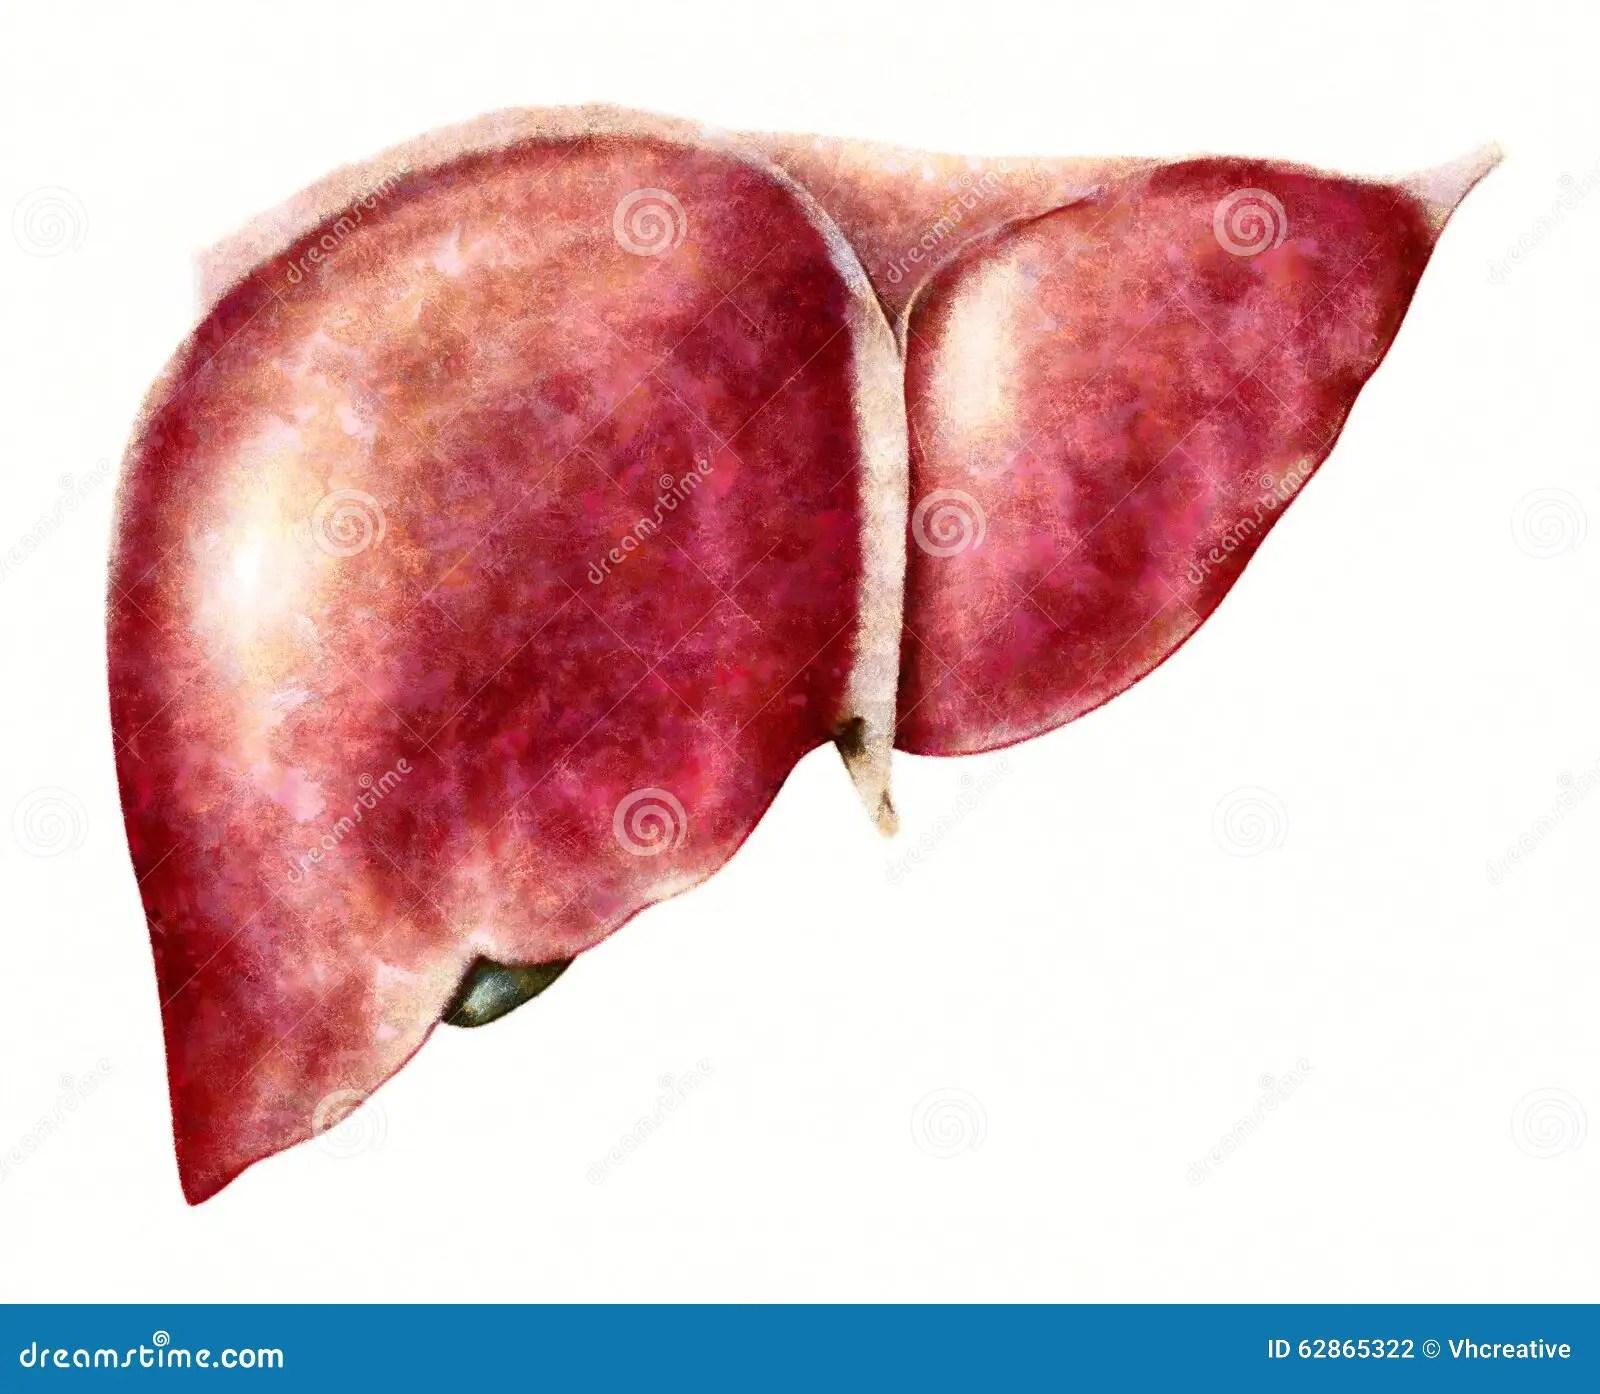 Human Liver Anatomy Illustration Stock Illustration